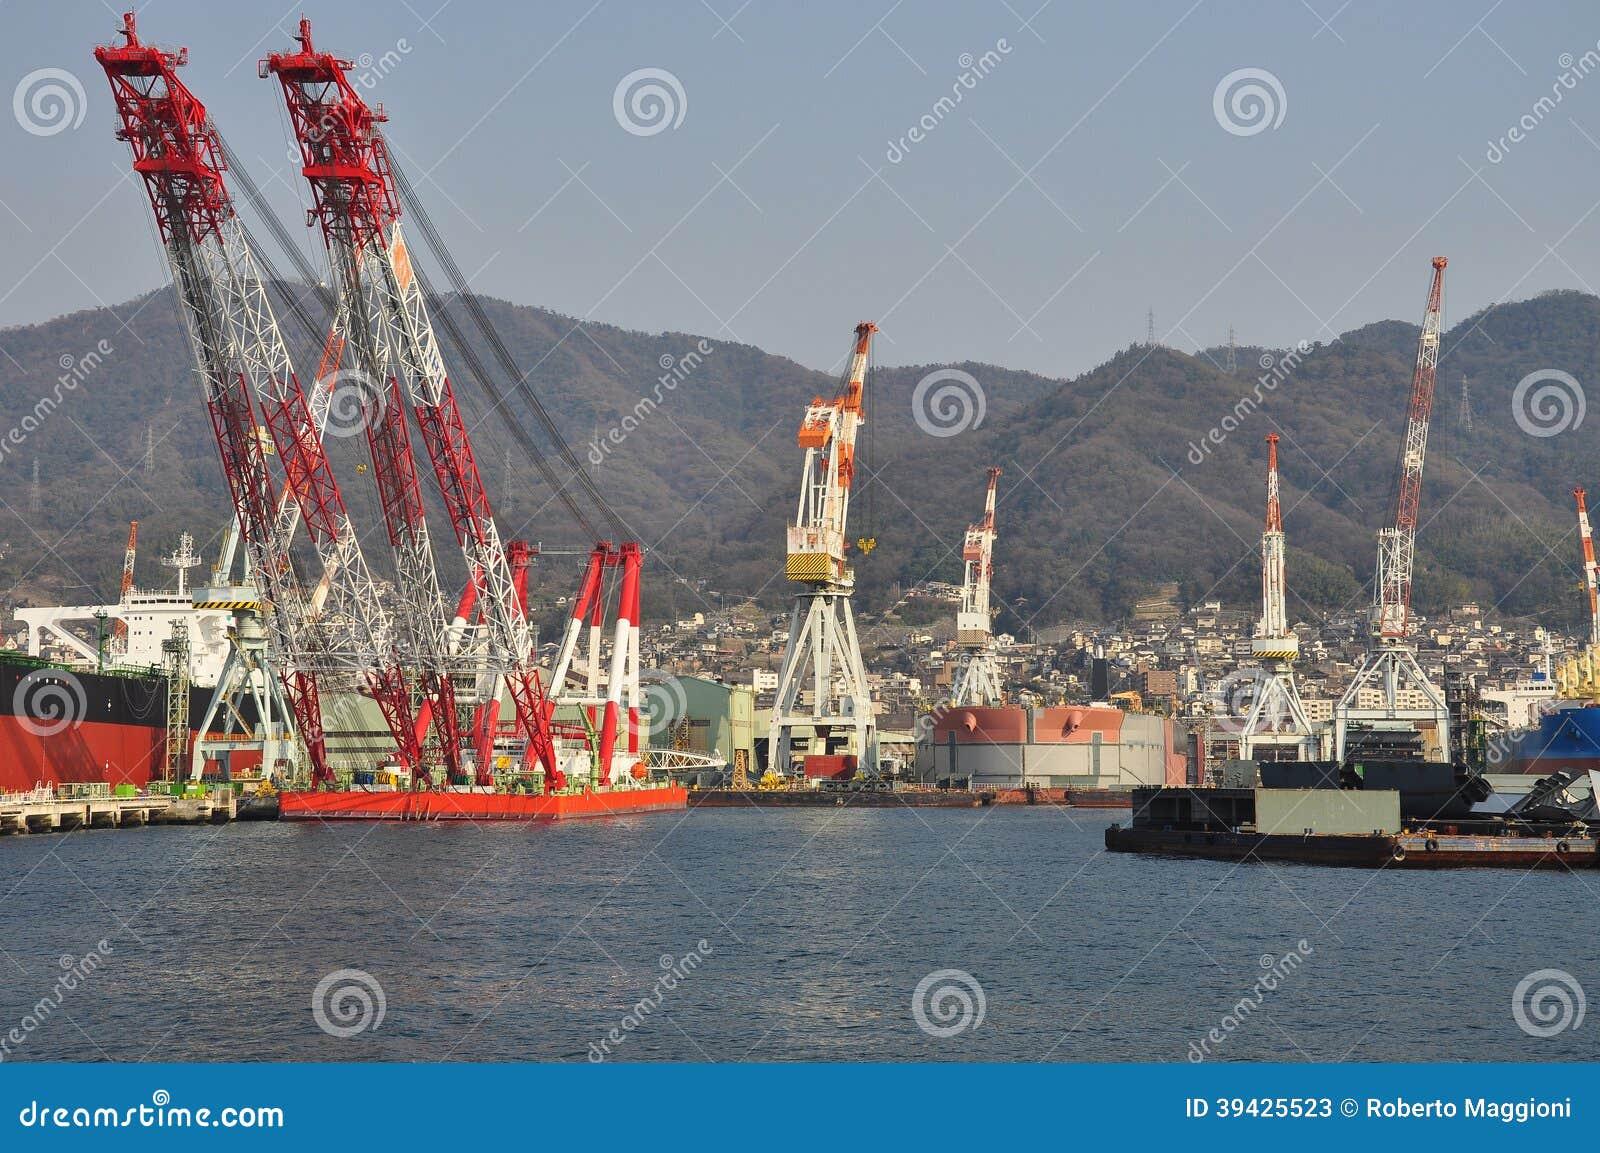 Ship building docks. Shipyard in Kure, Japan